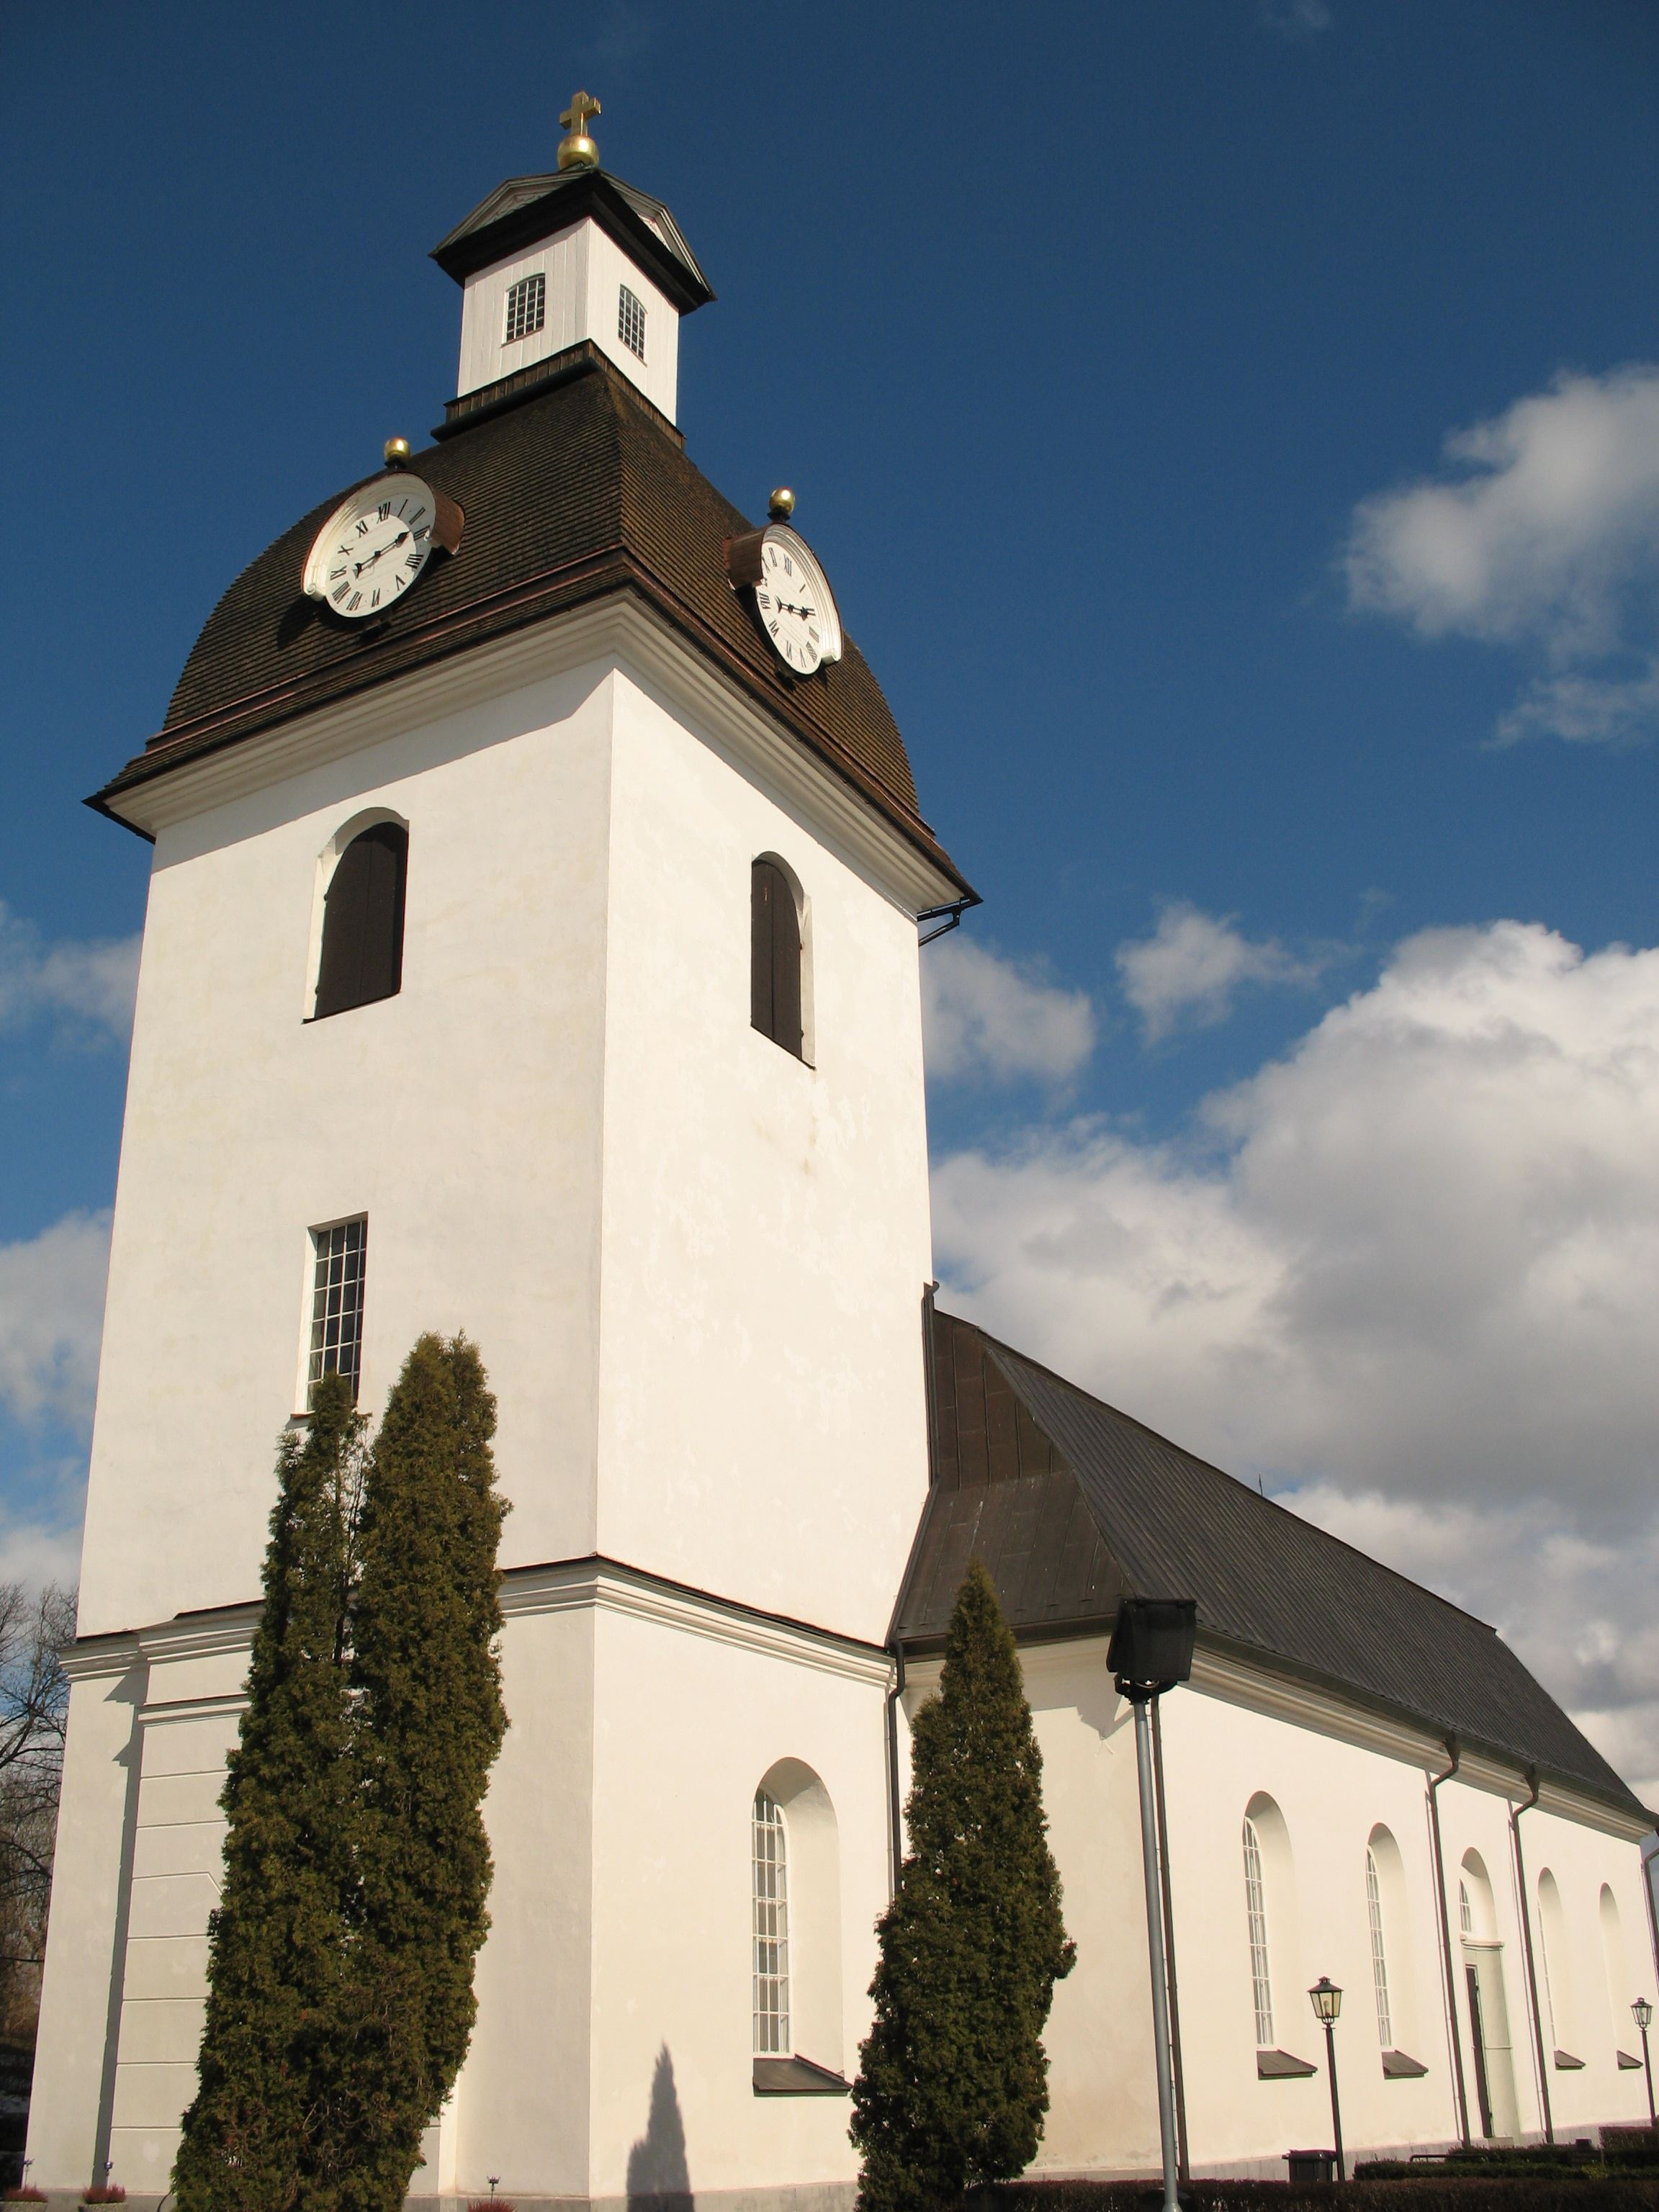 Kristdala church